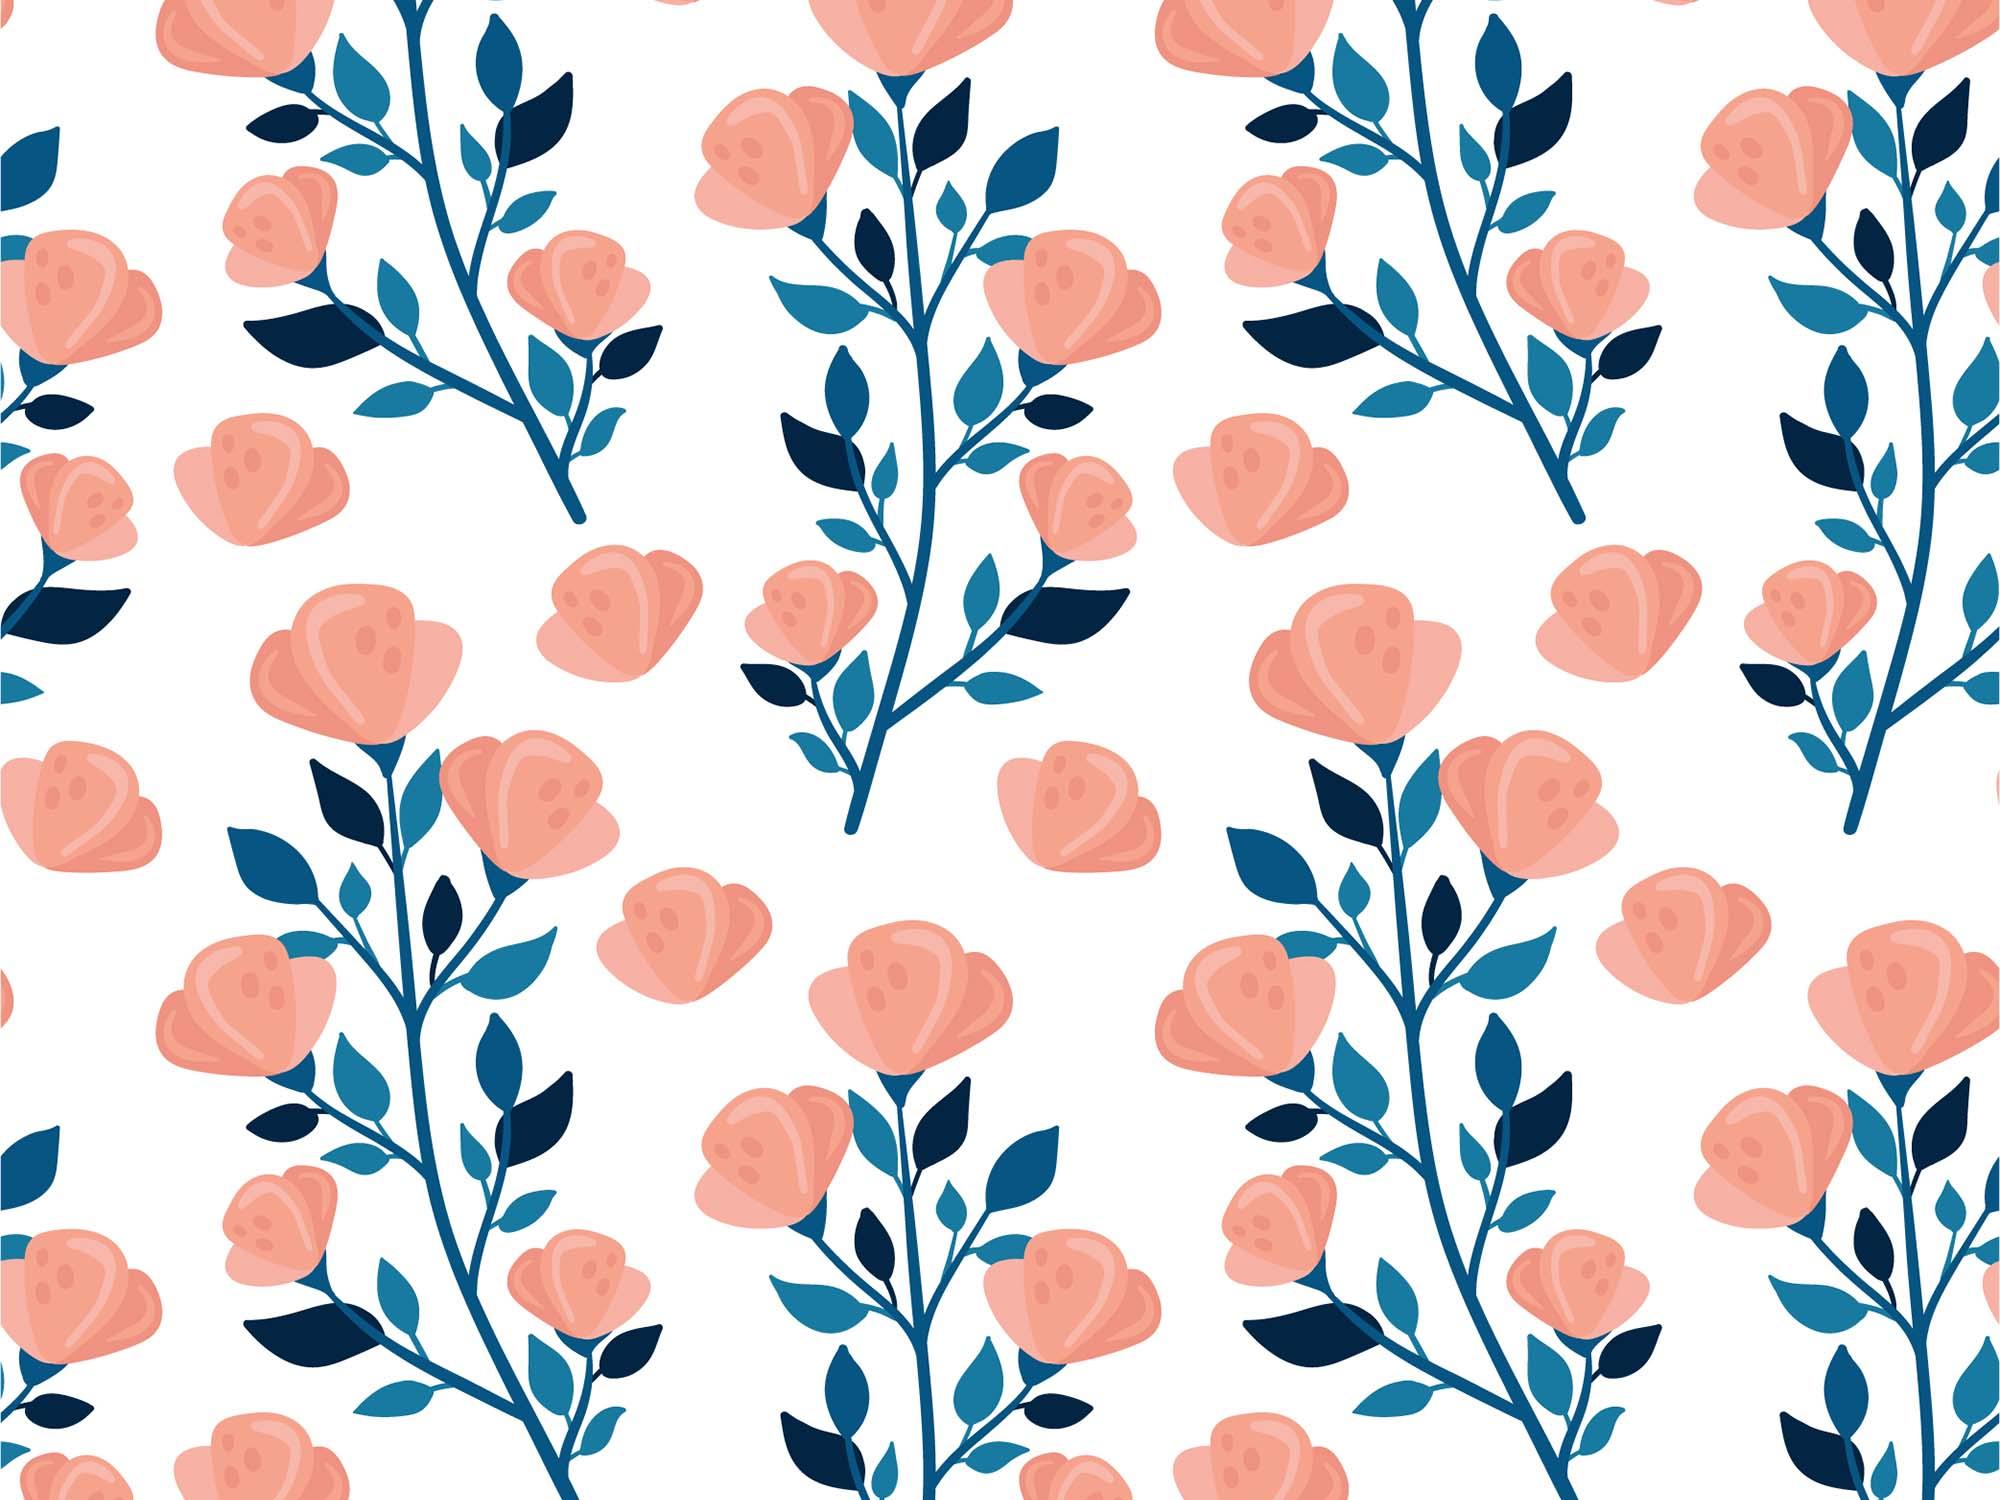 Floral Vector Patterns 2